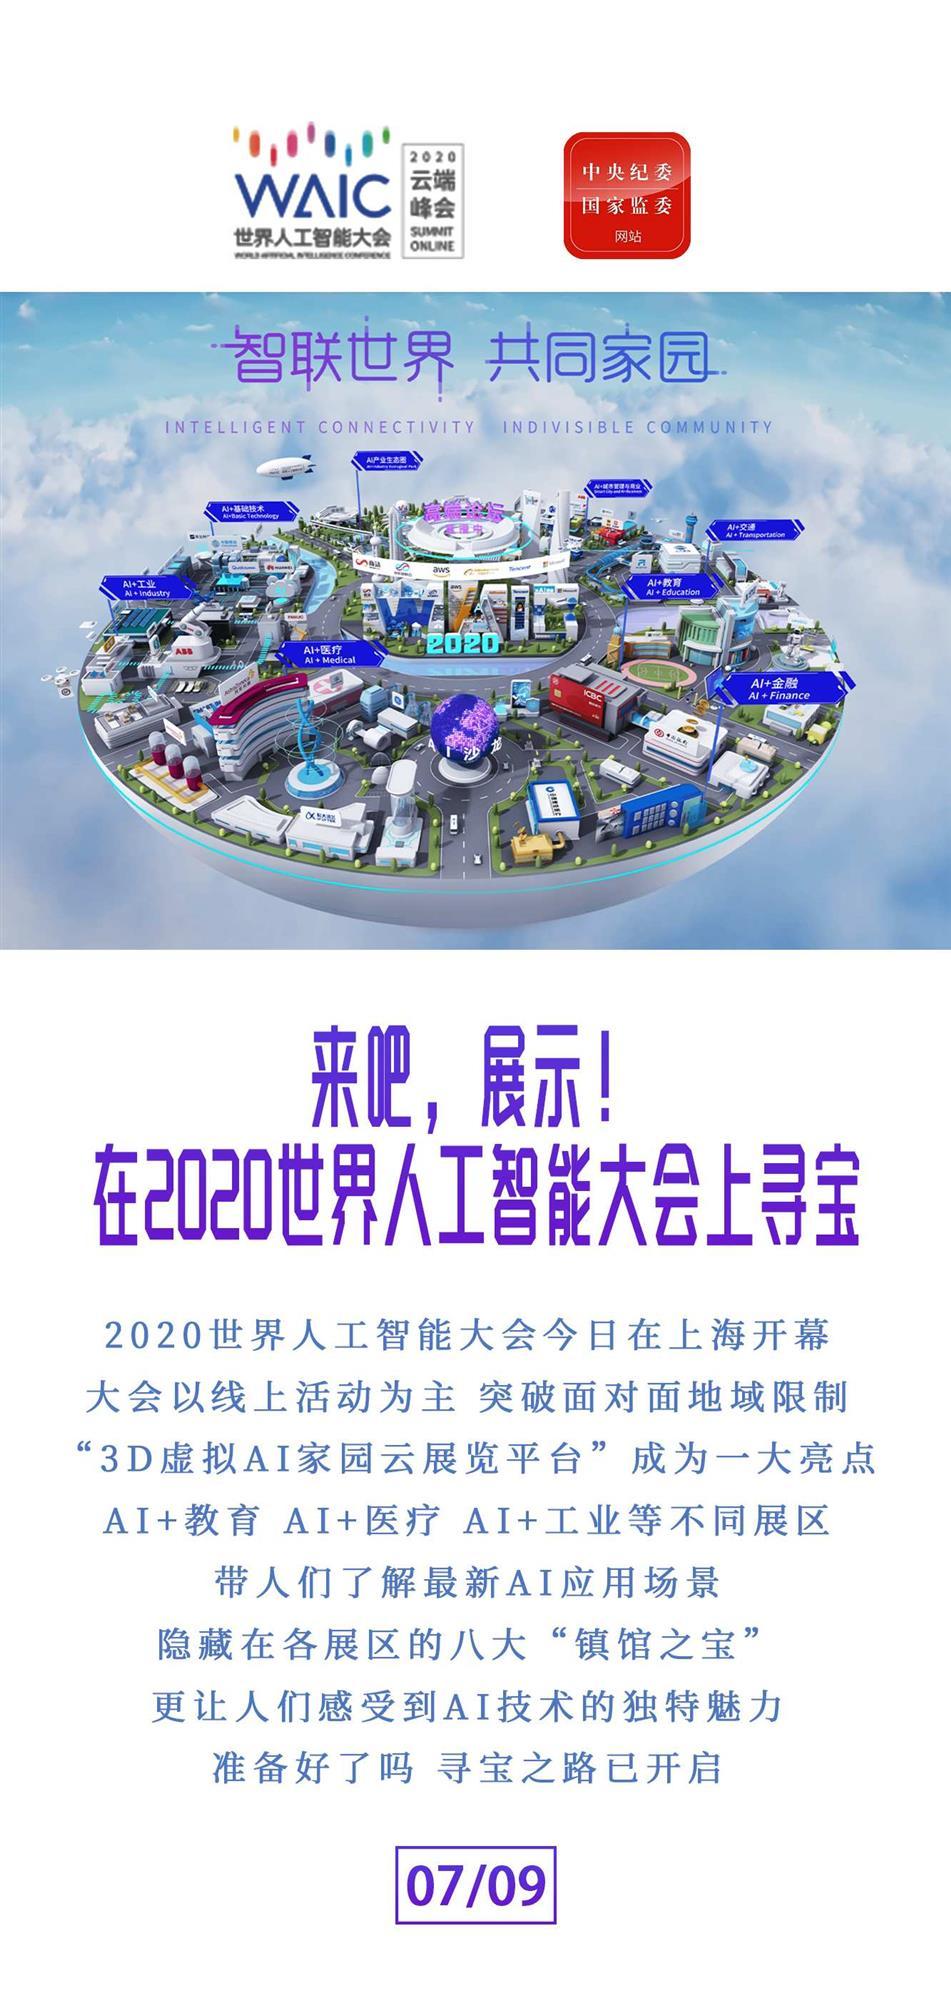 【sky平台】0世界人工sky平台智能大会上图片